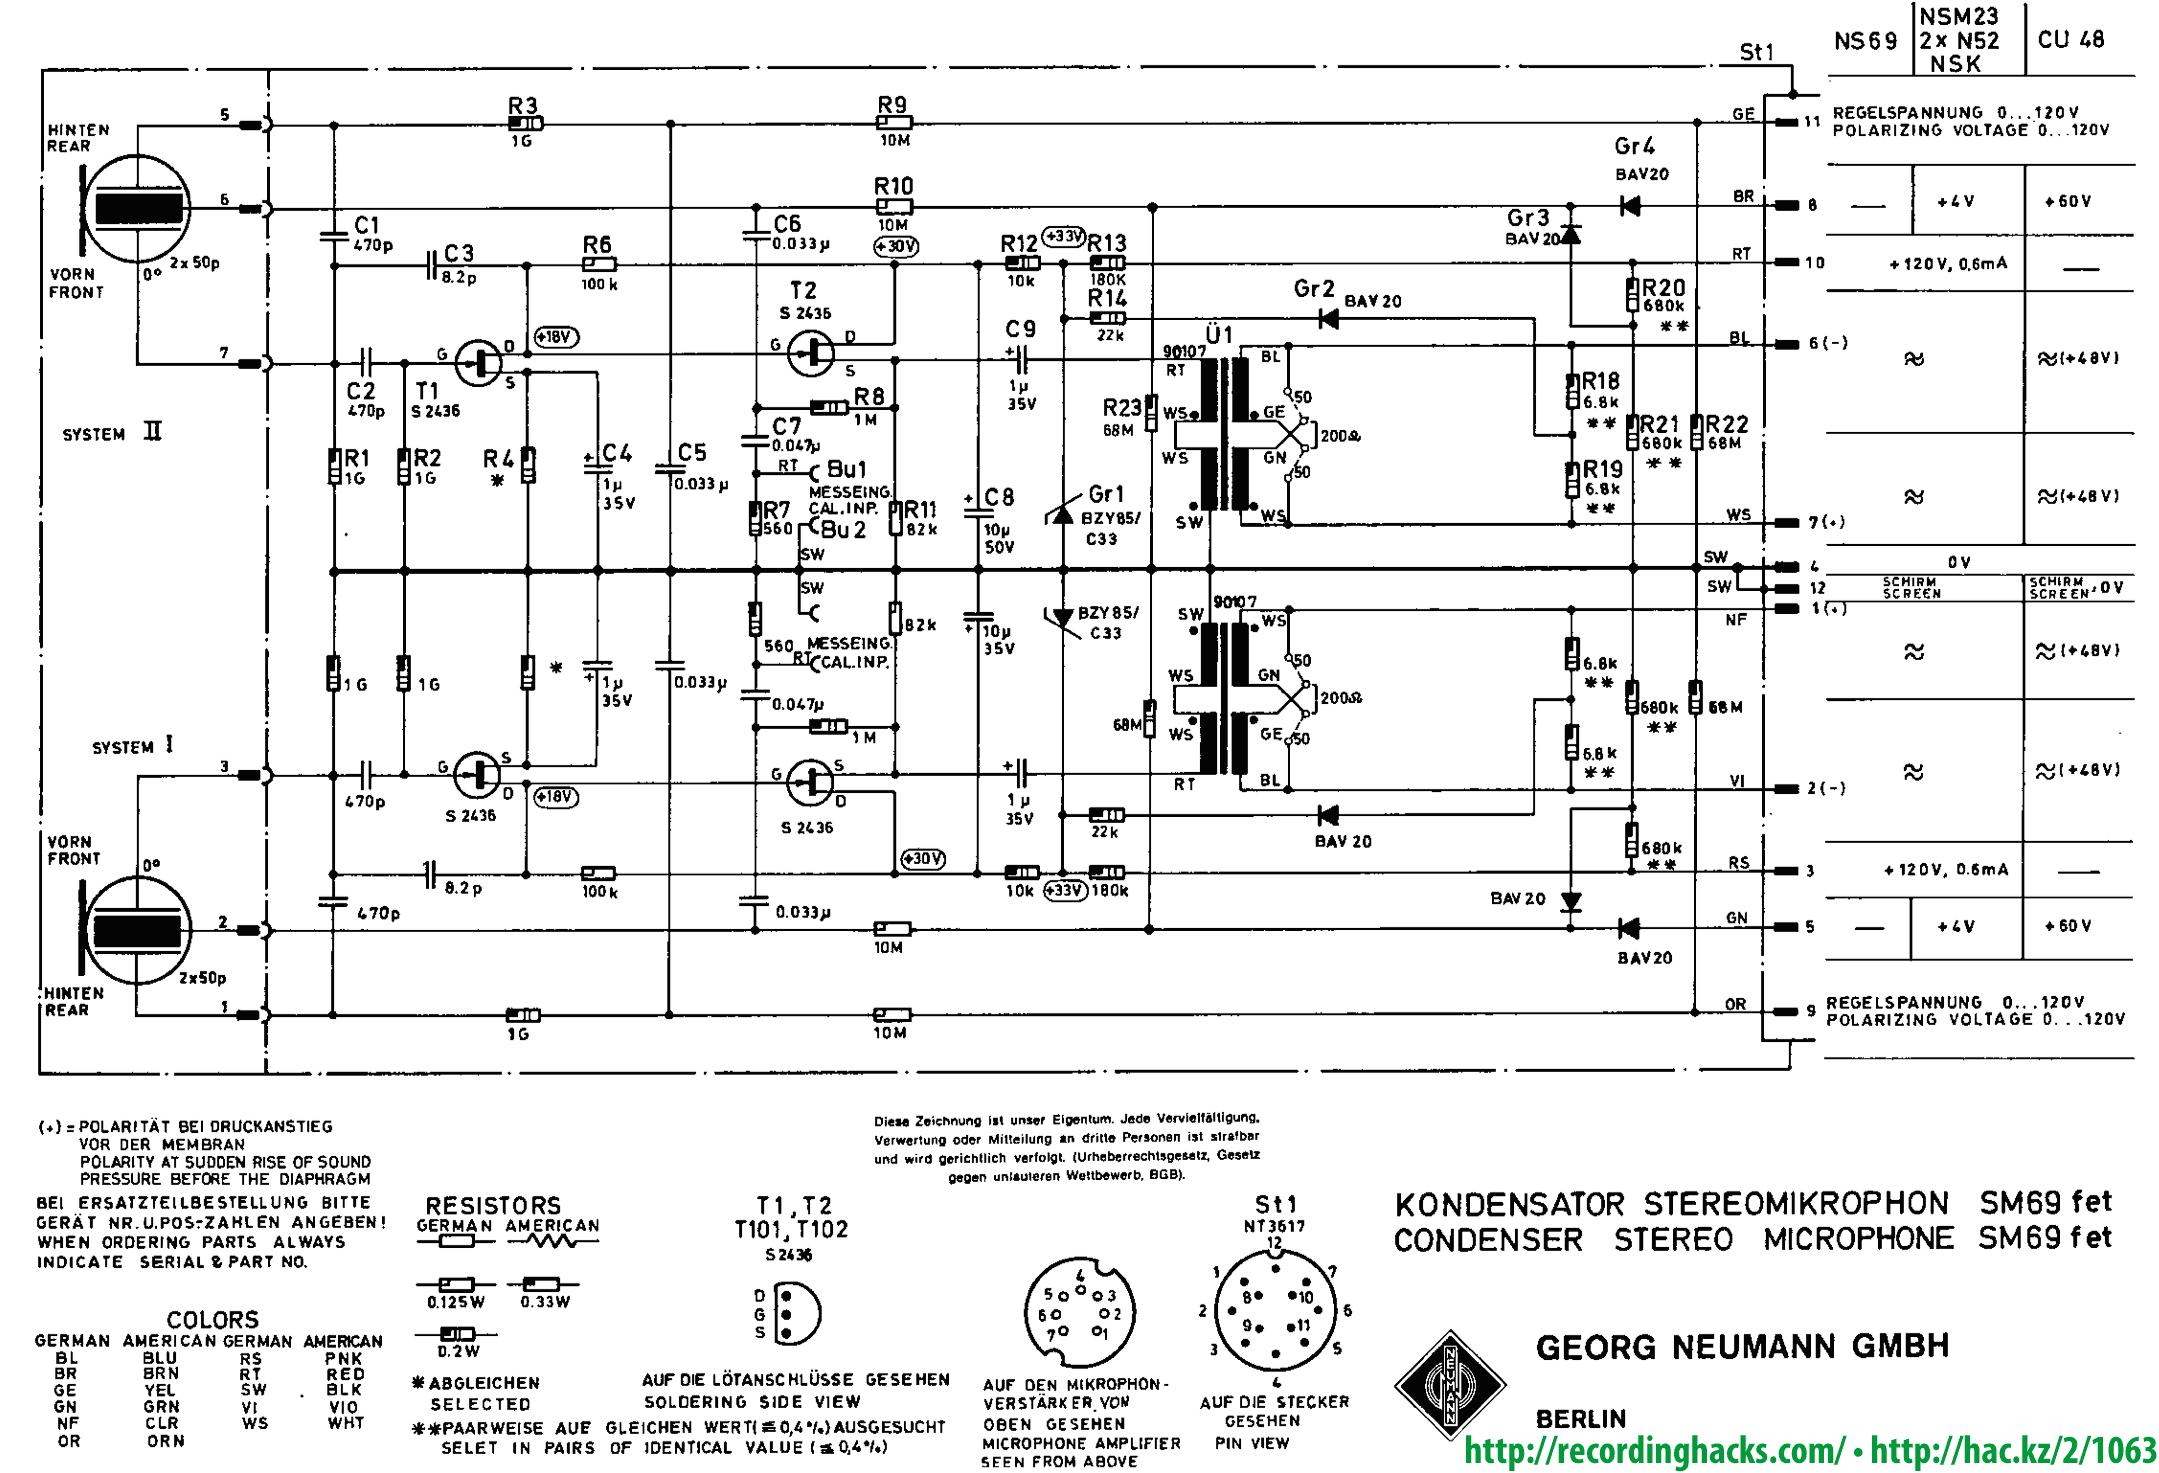 neumann u47 tube microphone schematic  neumann  get free image about wiring diagram